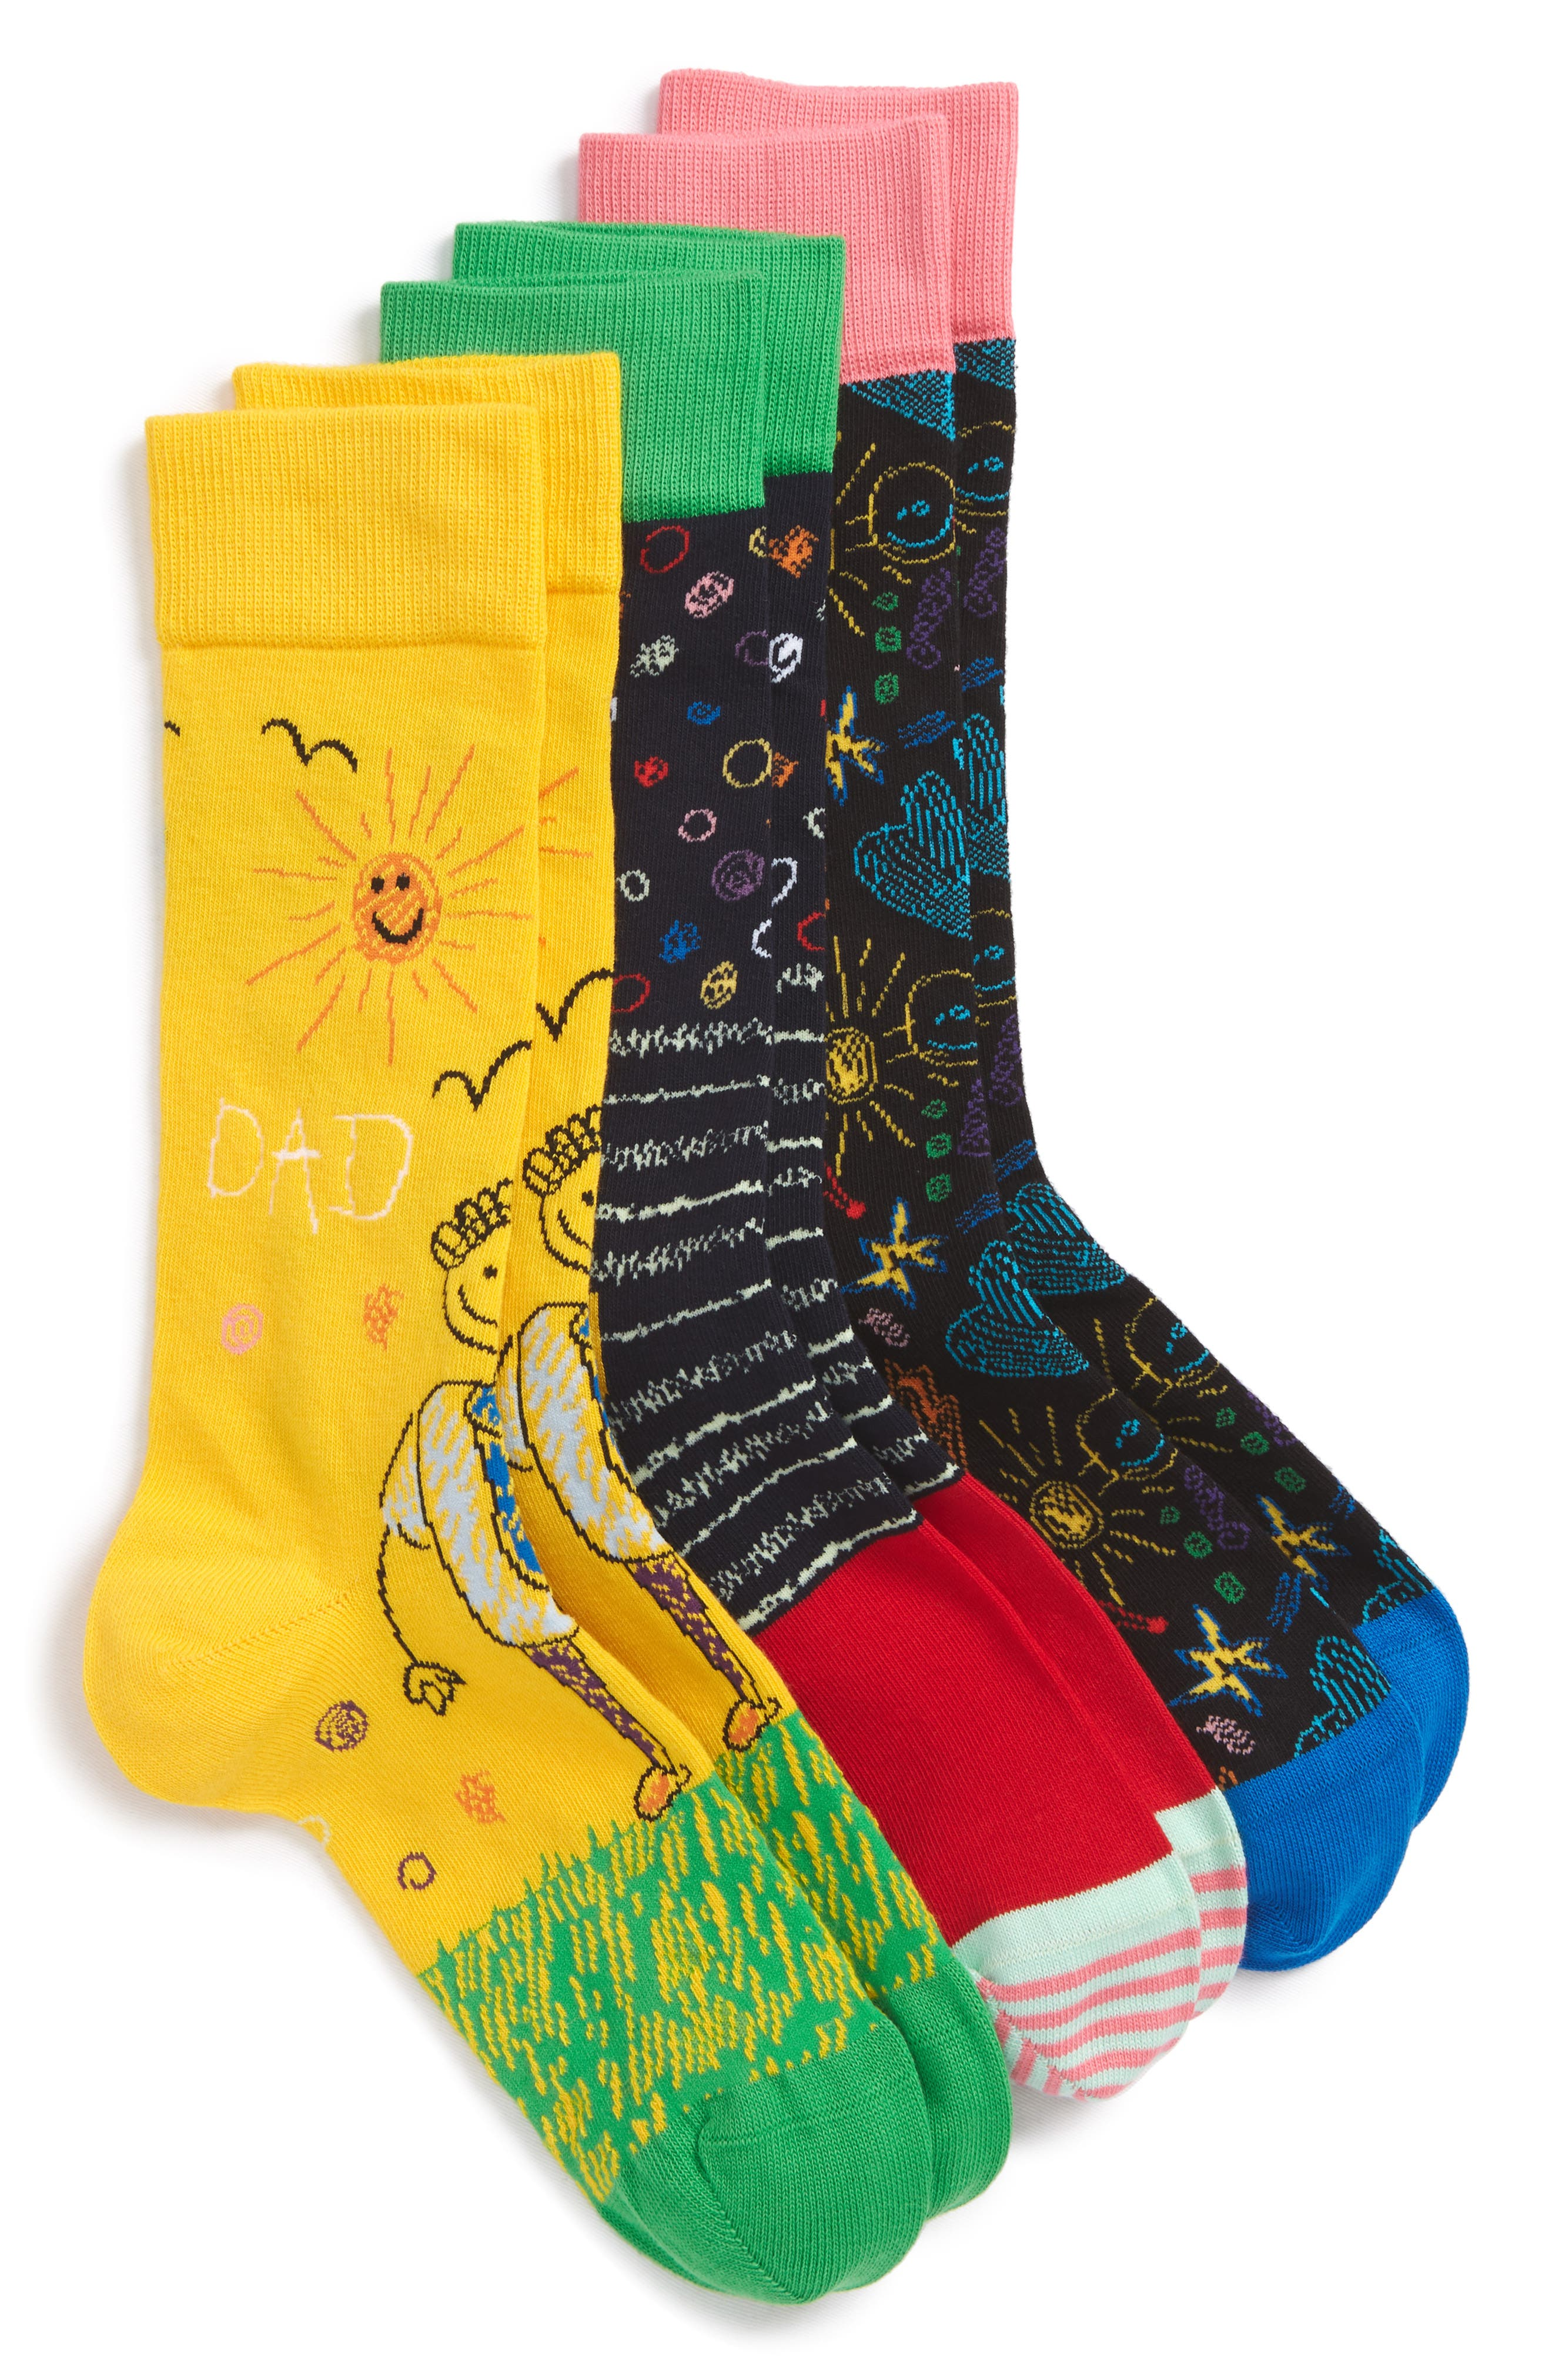 I Love You Dad 3-Pack Socks,                             Main thumbnail 1, color,                             Black/ Yellow Multi